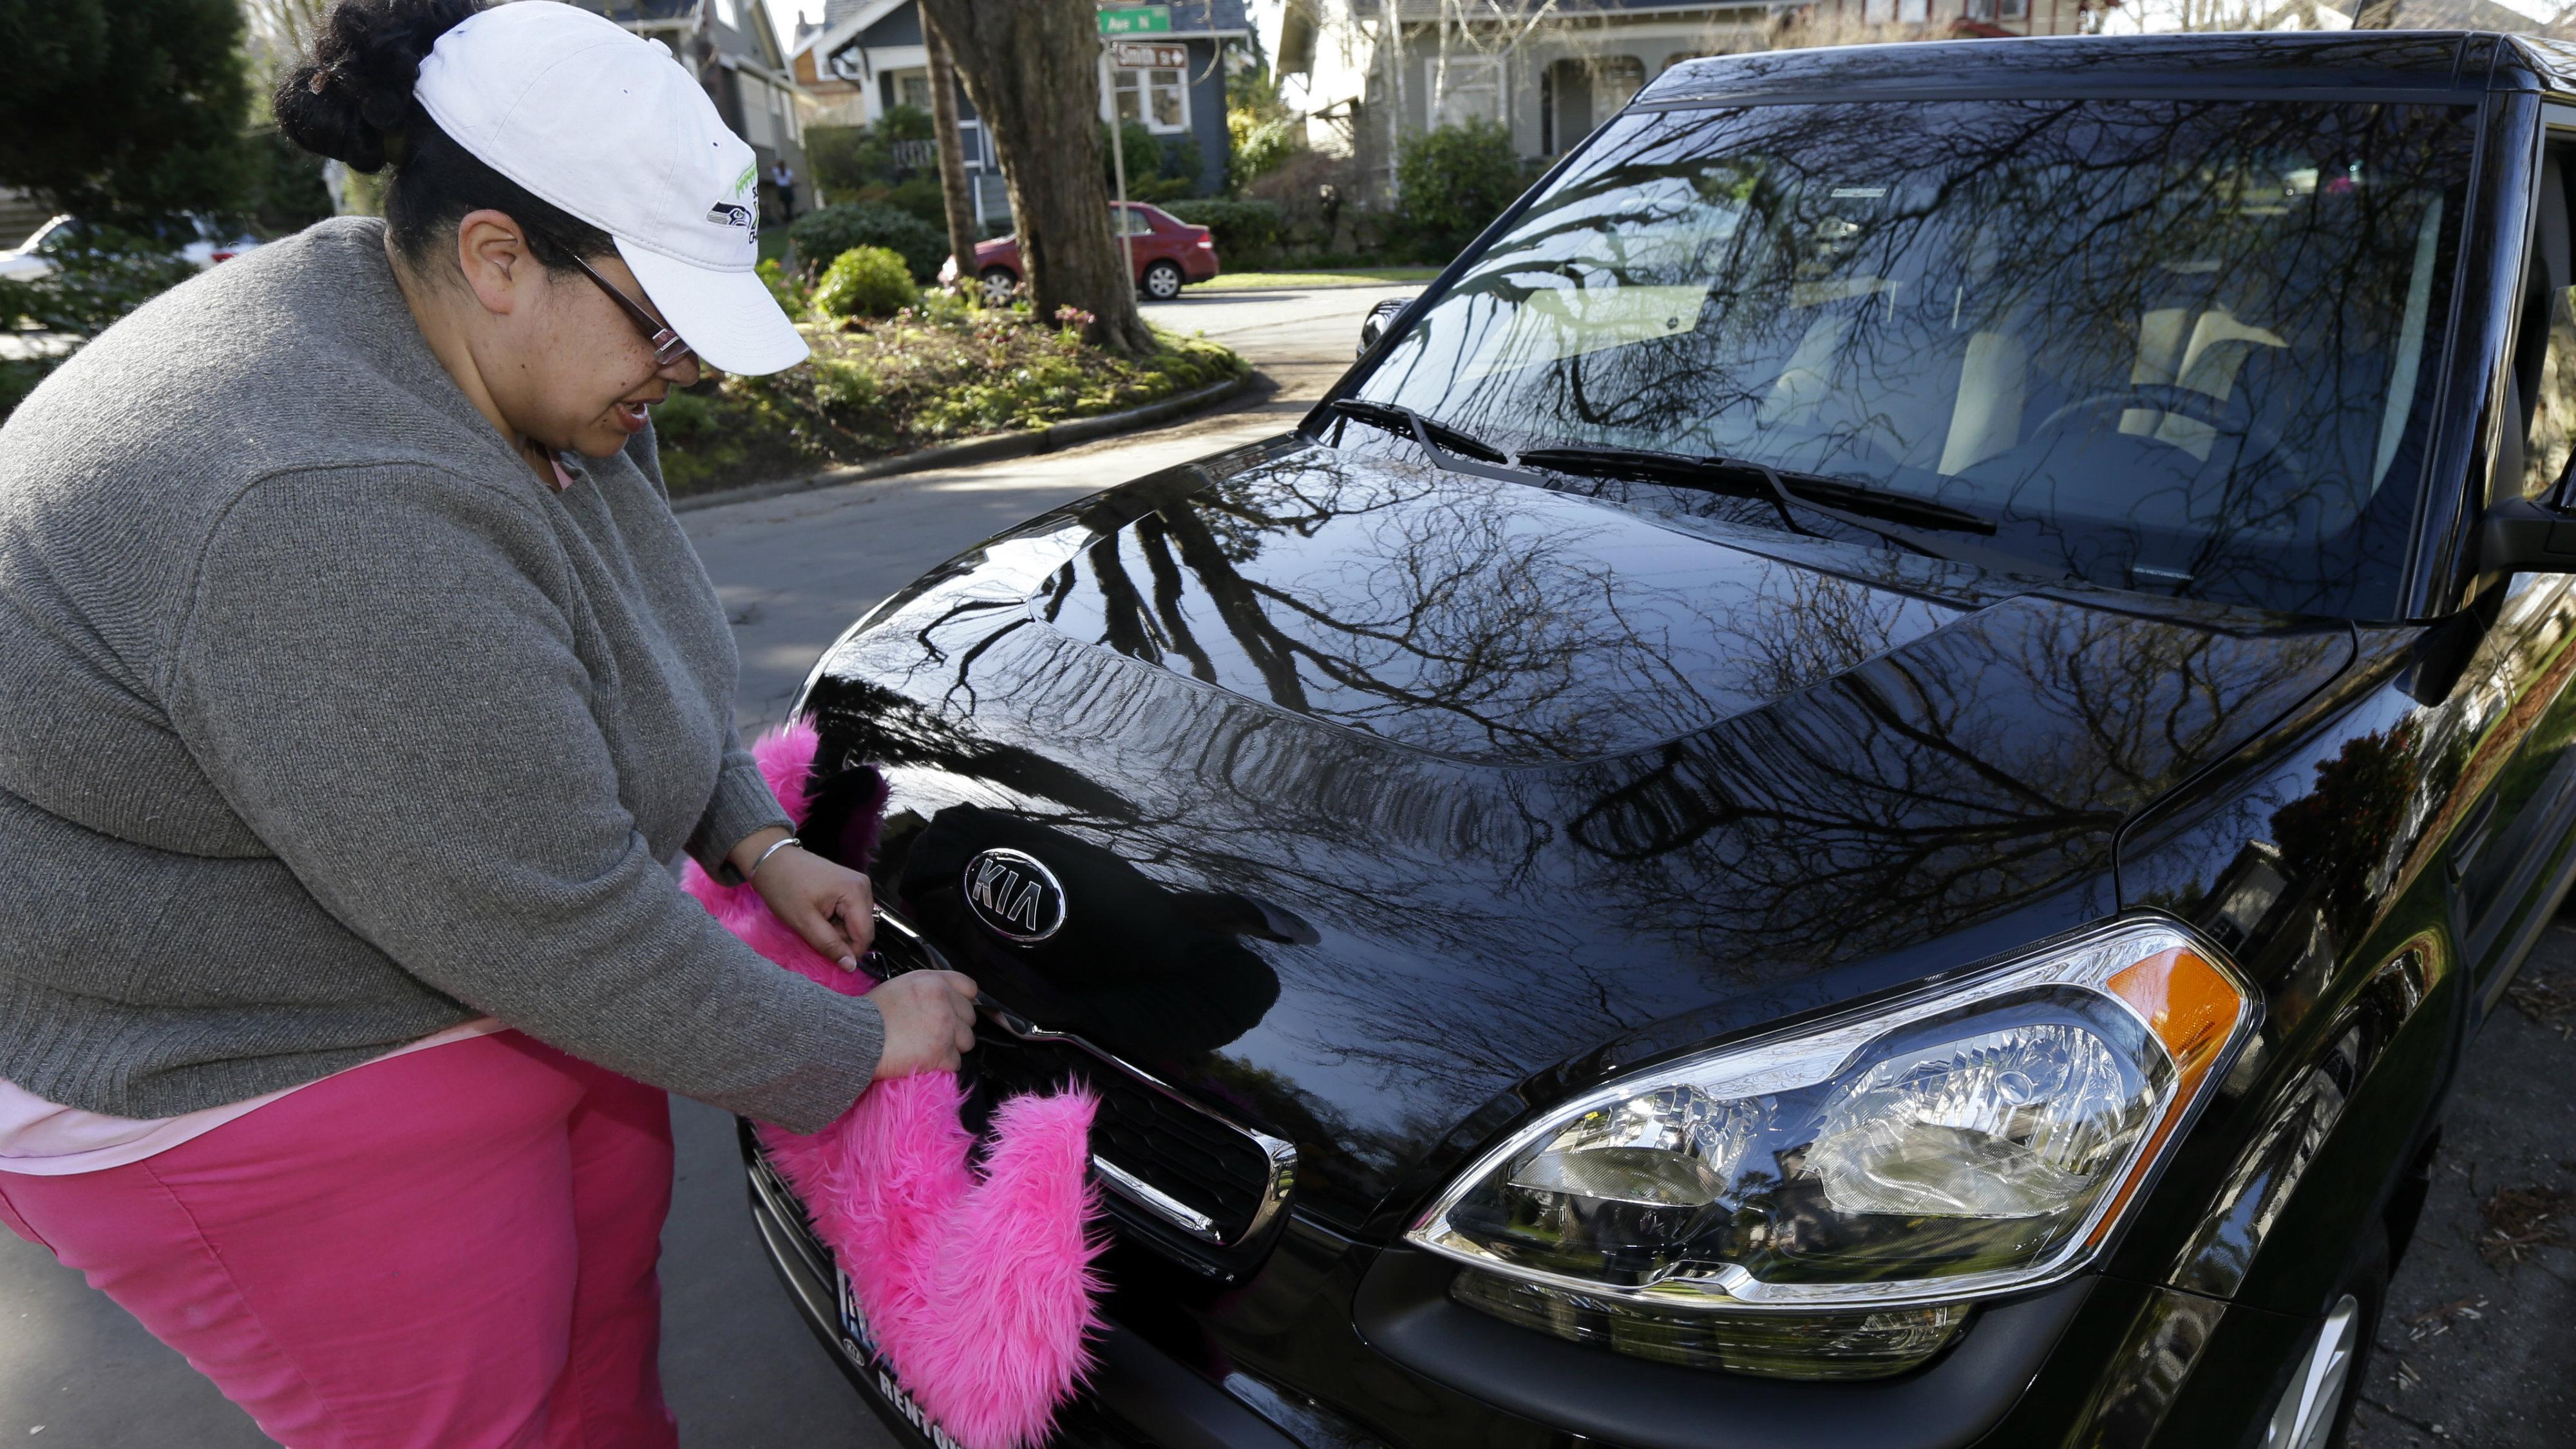 Lyft Driver adjusting the pink mustache on her car.